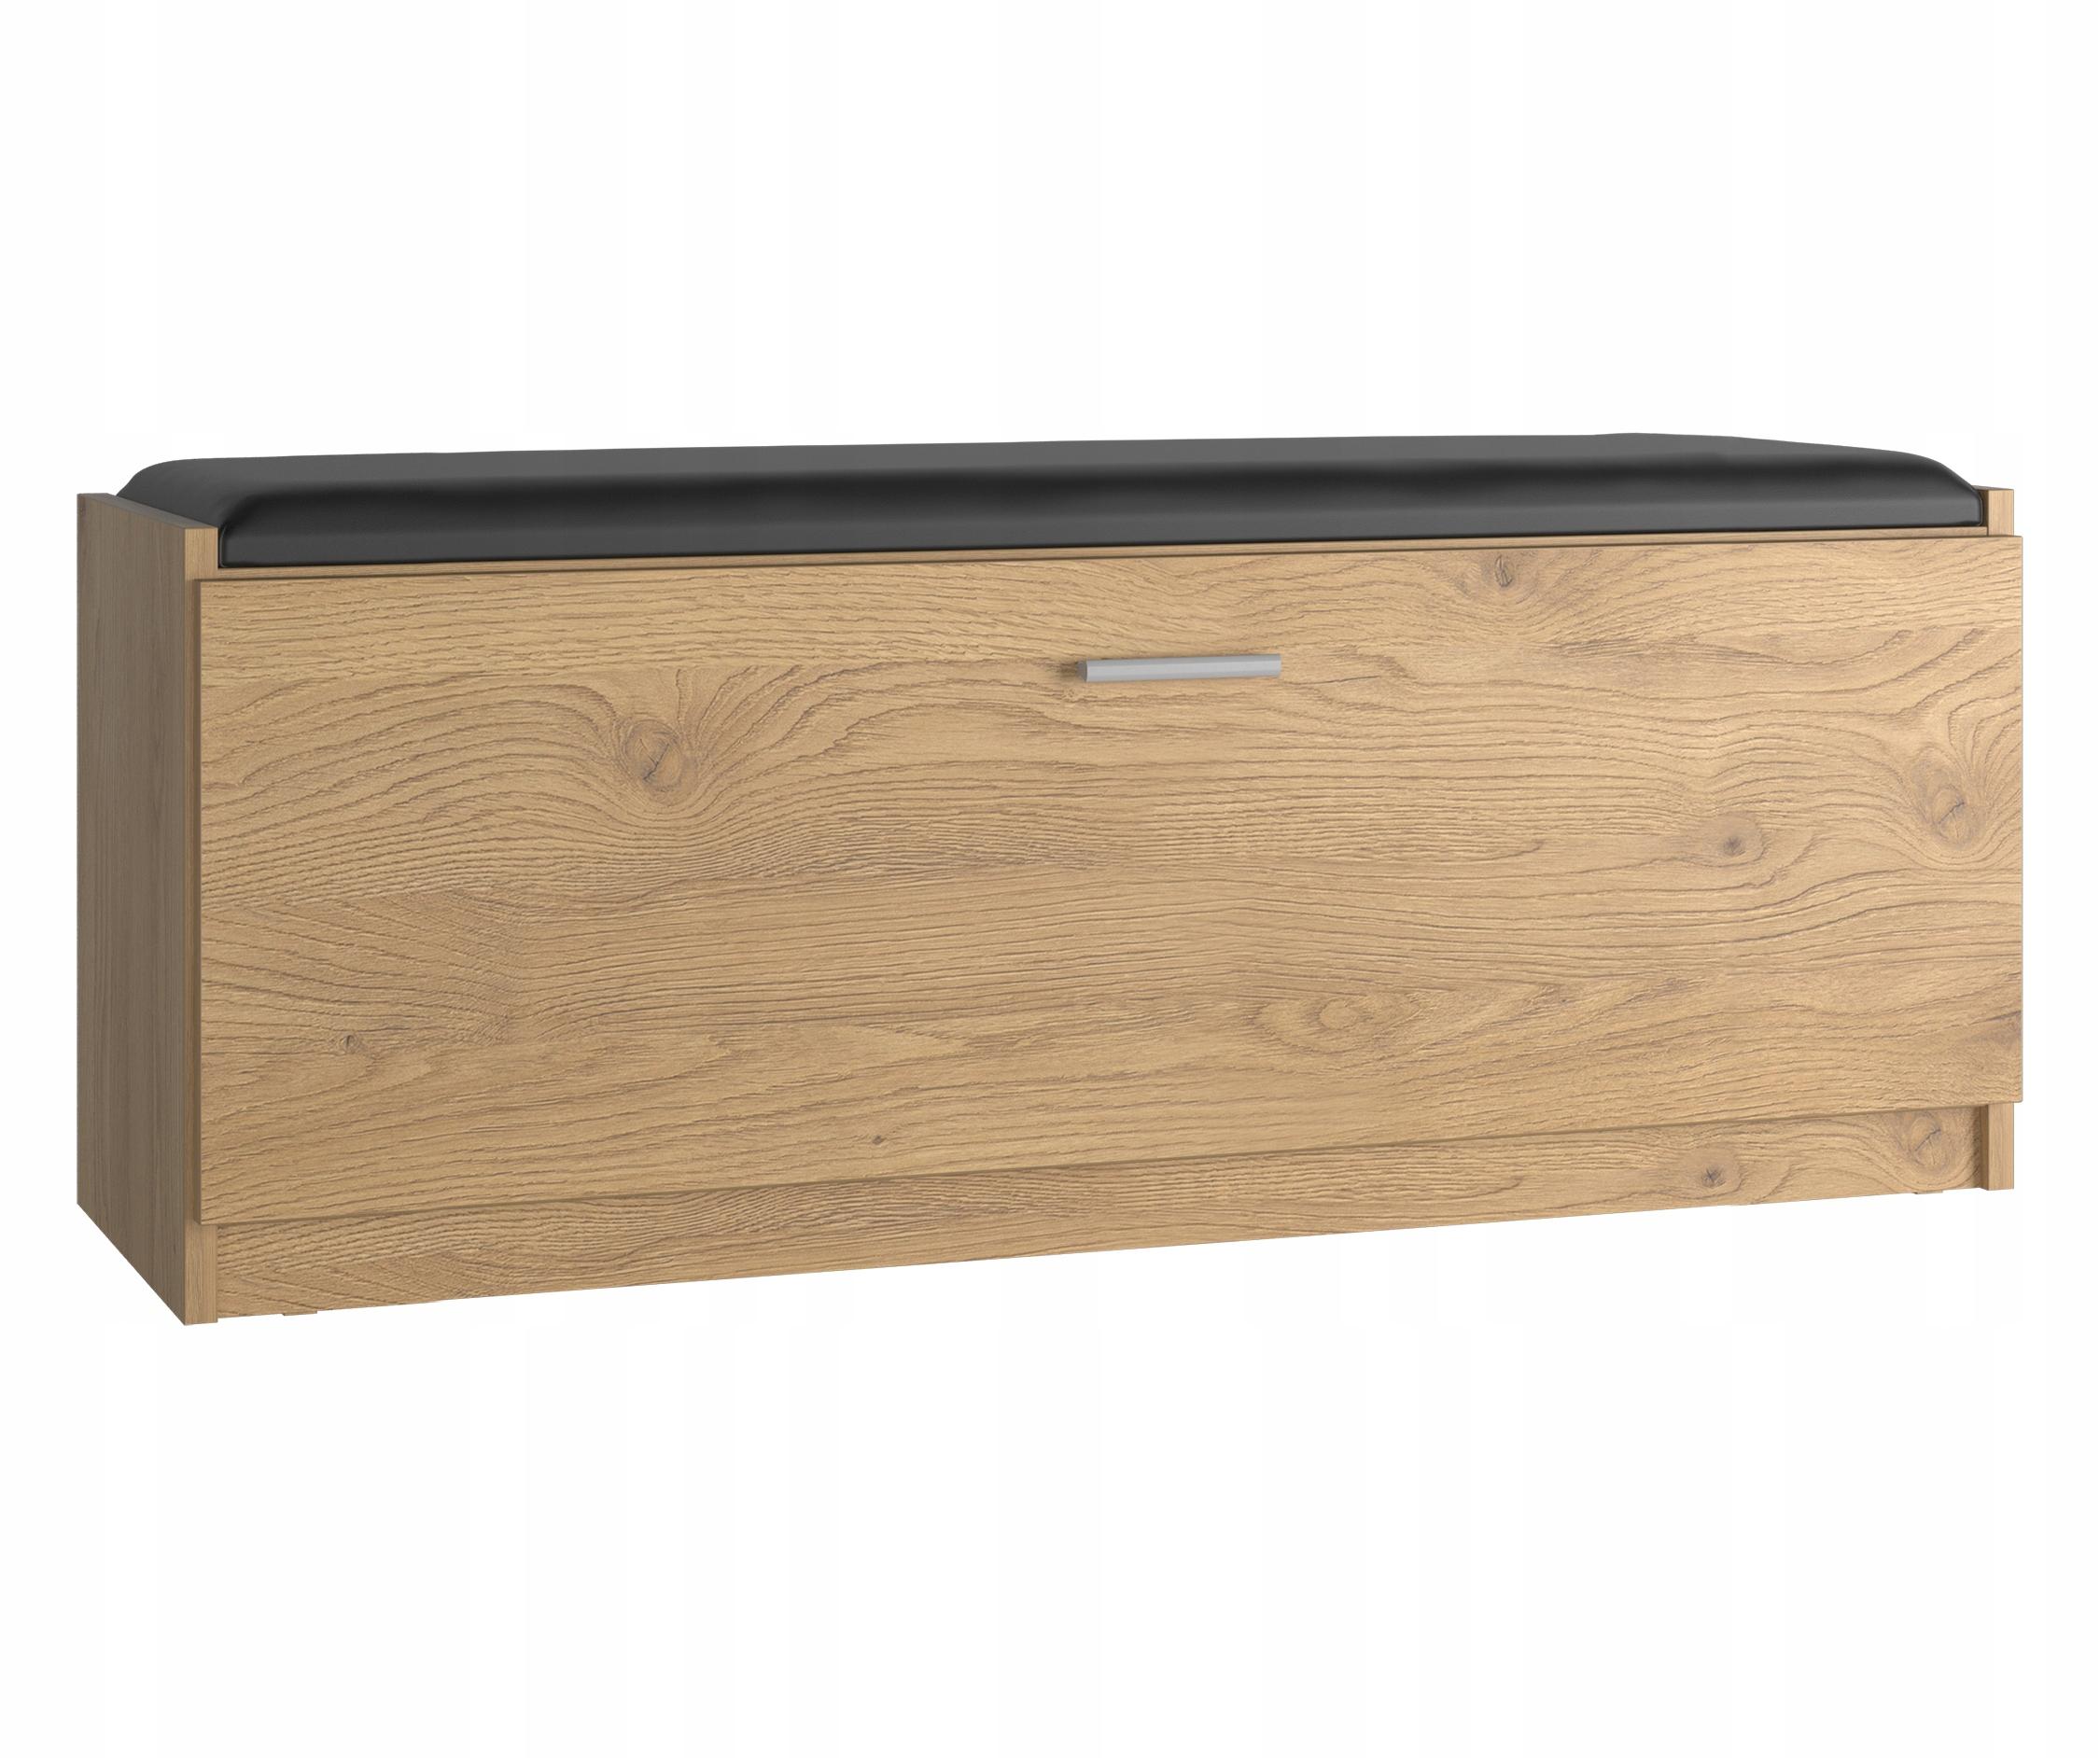 100 cm ELEGANTNÉ TOPÁNKY SKRINKA S SEAT. SBE1100